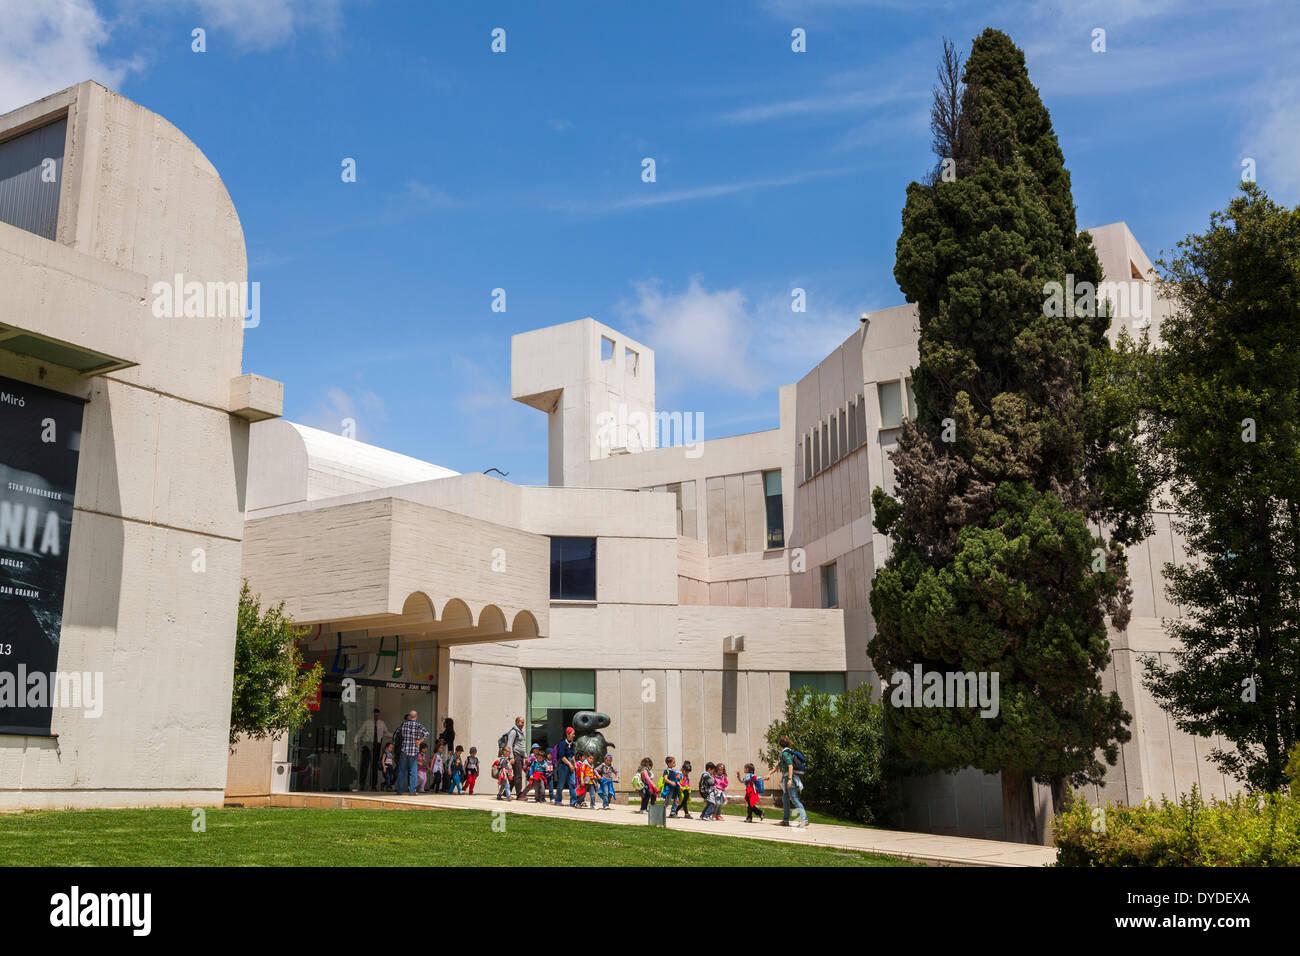 Young school children leaving the Fundacio Joan Miro Foundation in Barcelona. - Stock Image